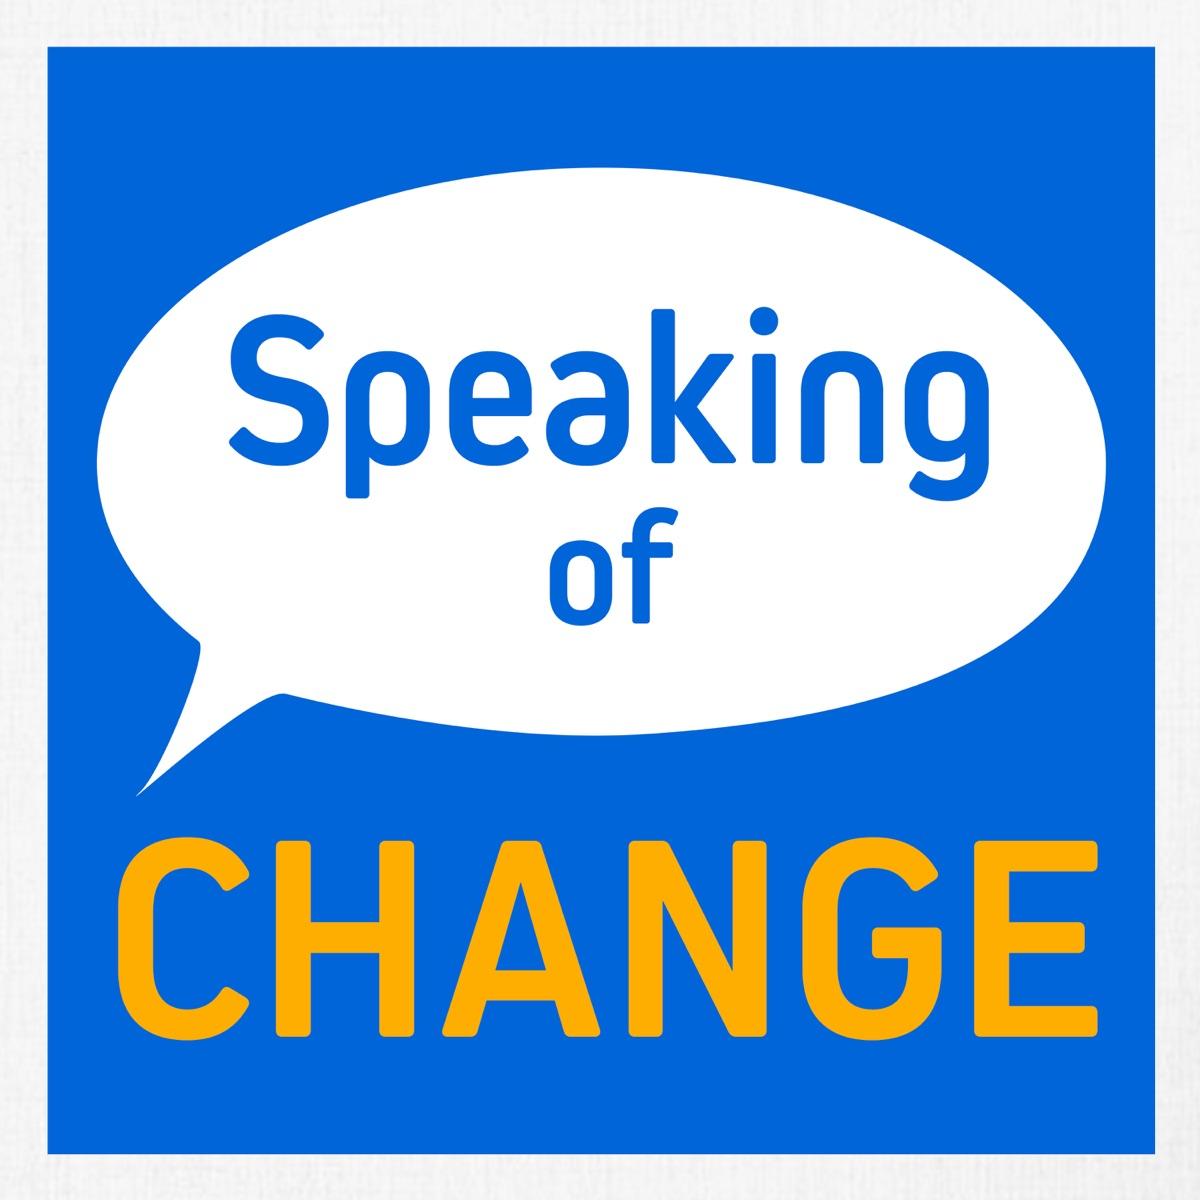 Speaking of Change